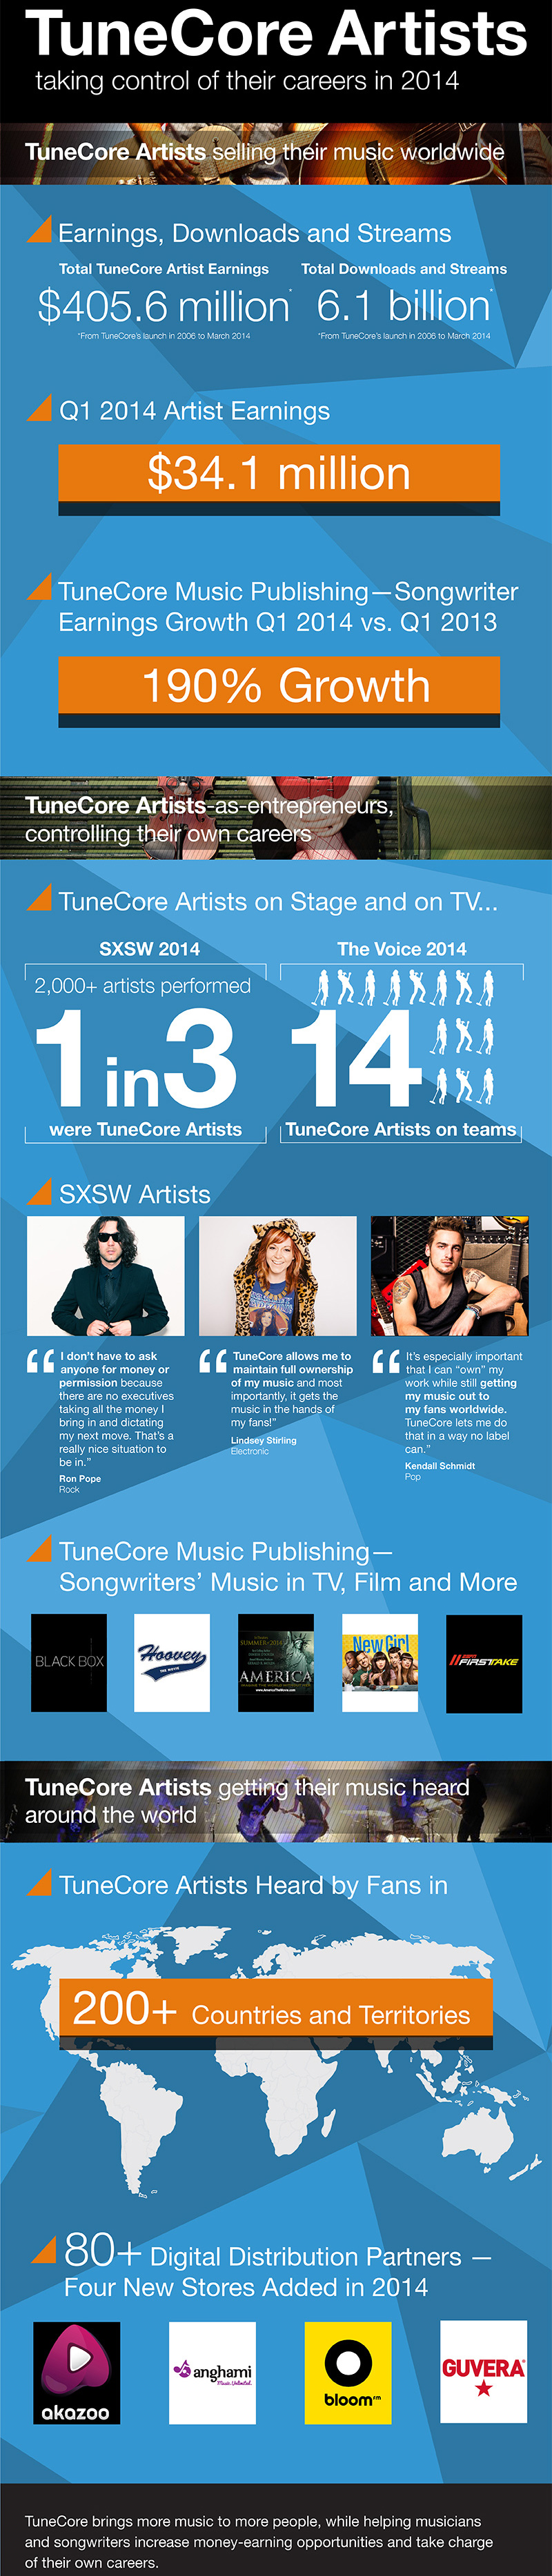 Tunecore_artist_milestones_2014_middle